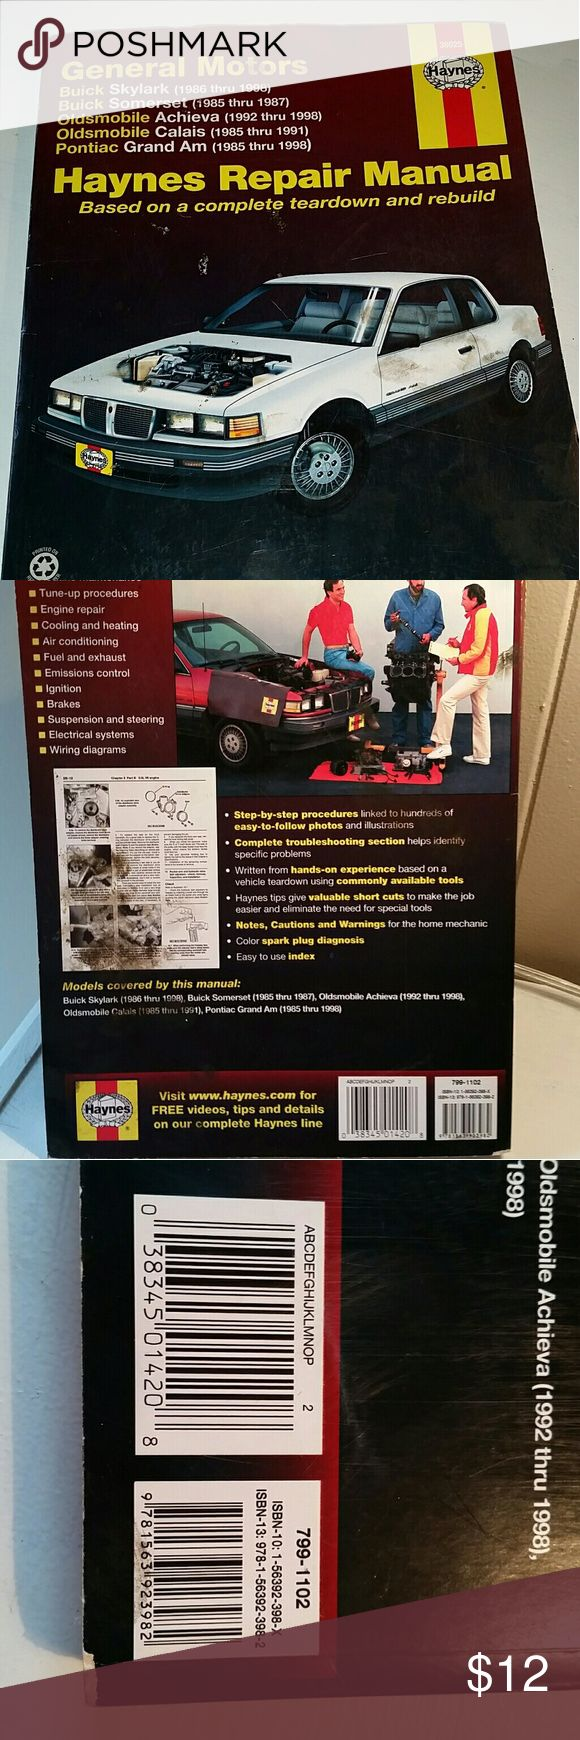 Haynes Repair Manual Haynes Repair Manual - Genersl Motors - Buick Skylark (1986-1998) , Buik Sonerset (1985-1987), Oldsmobile Achieva (1992-1998), Oldsmobile Calais (1985-1991), Pontiac Grand Am (1985-1998) Haynes Other